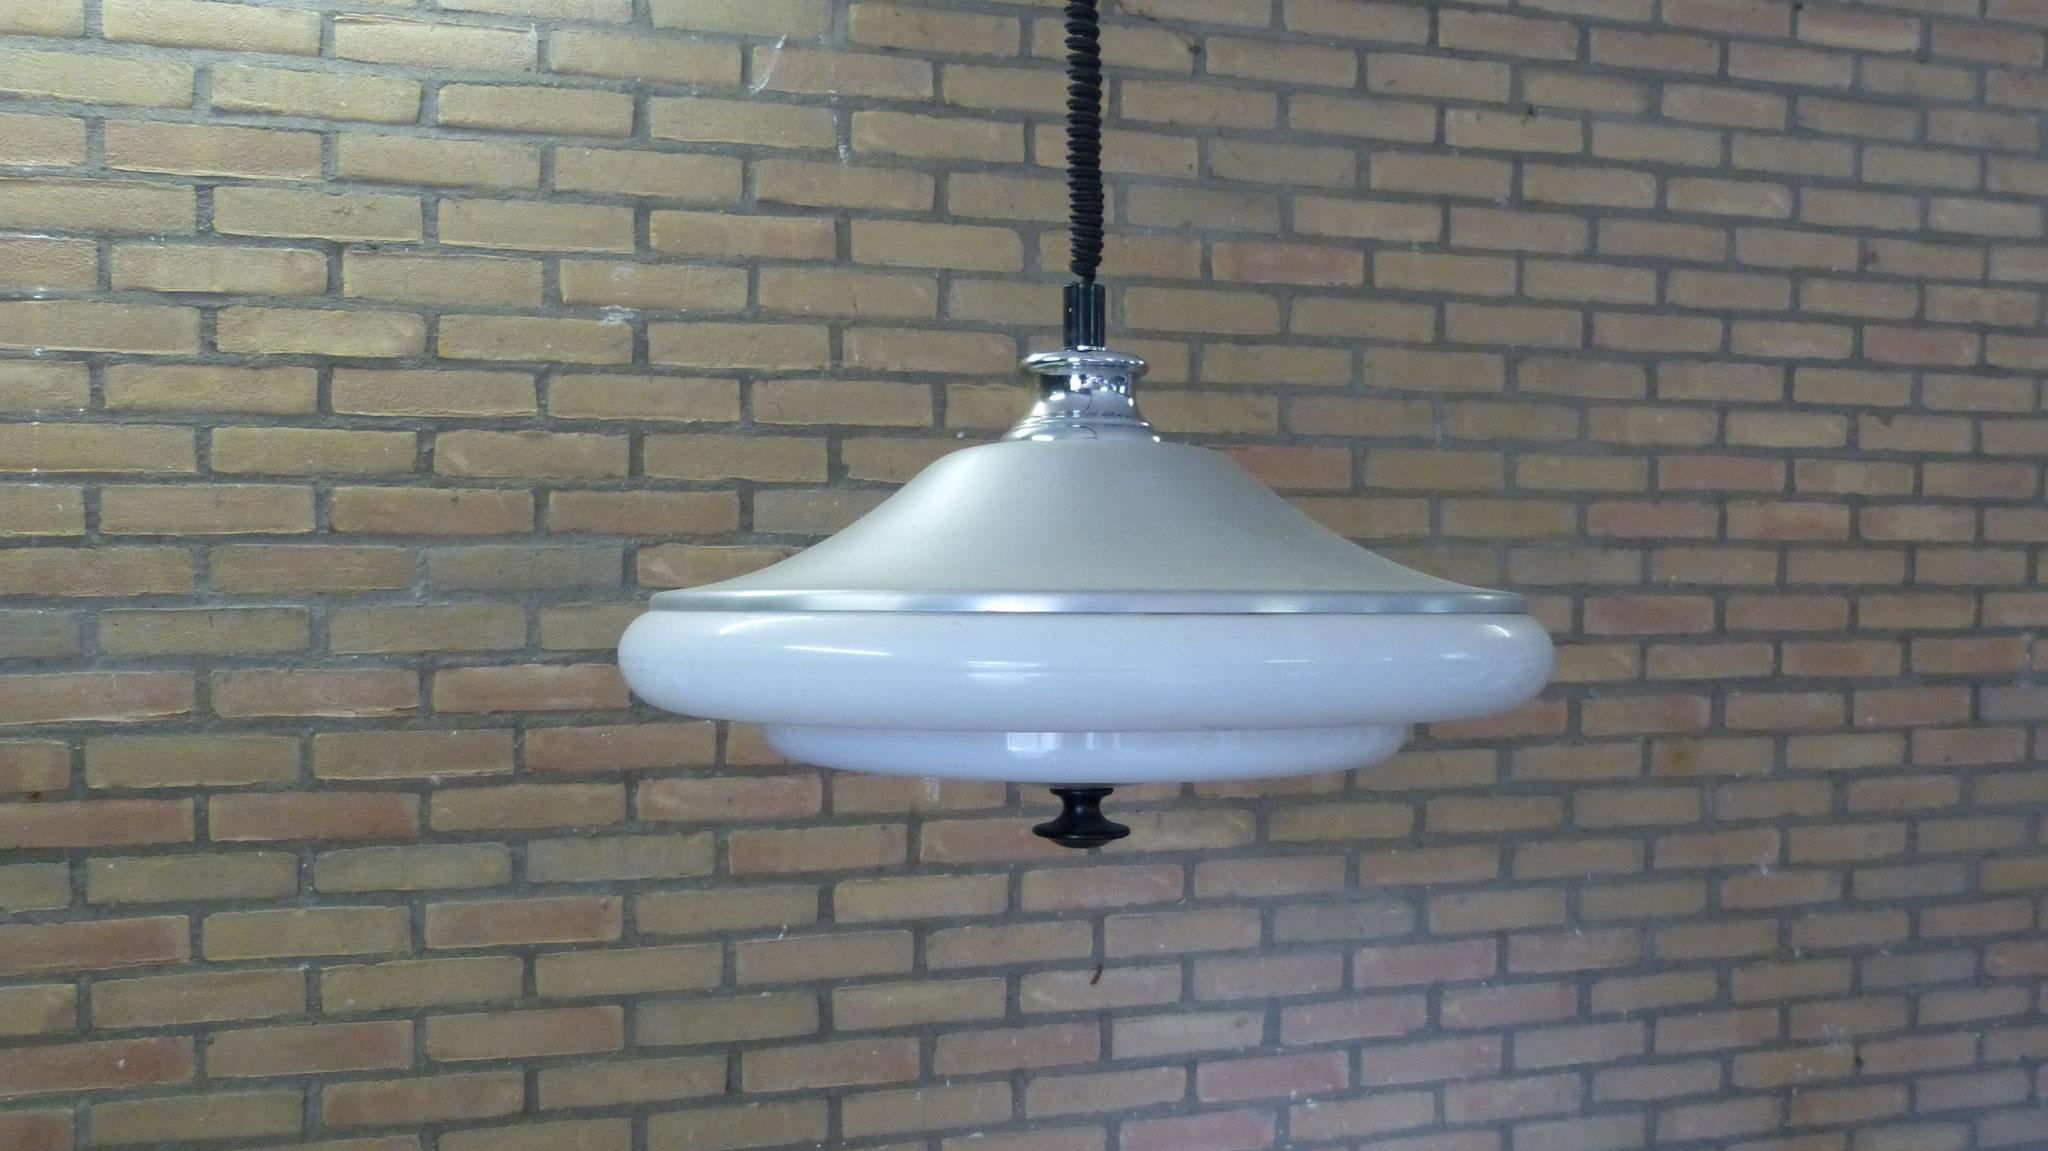 Hanglamp met pendel